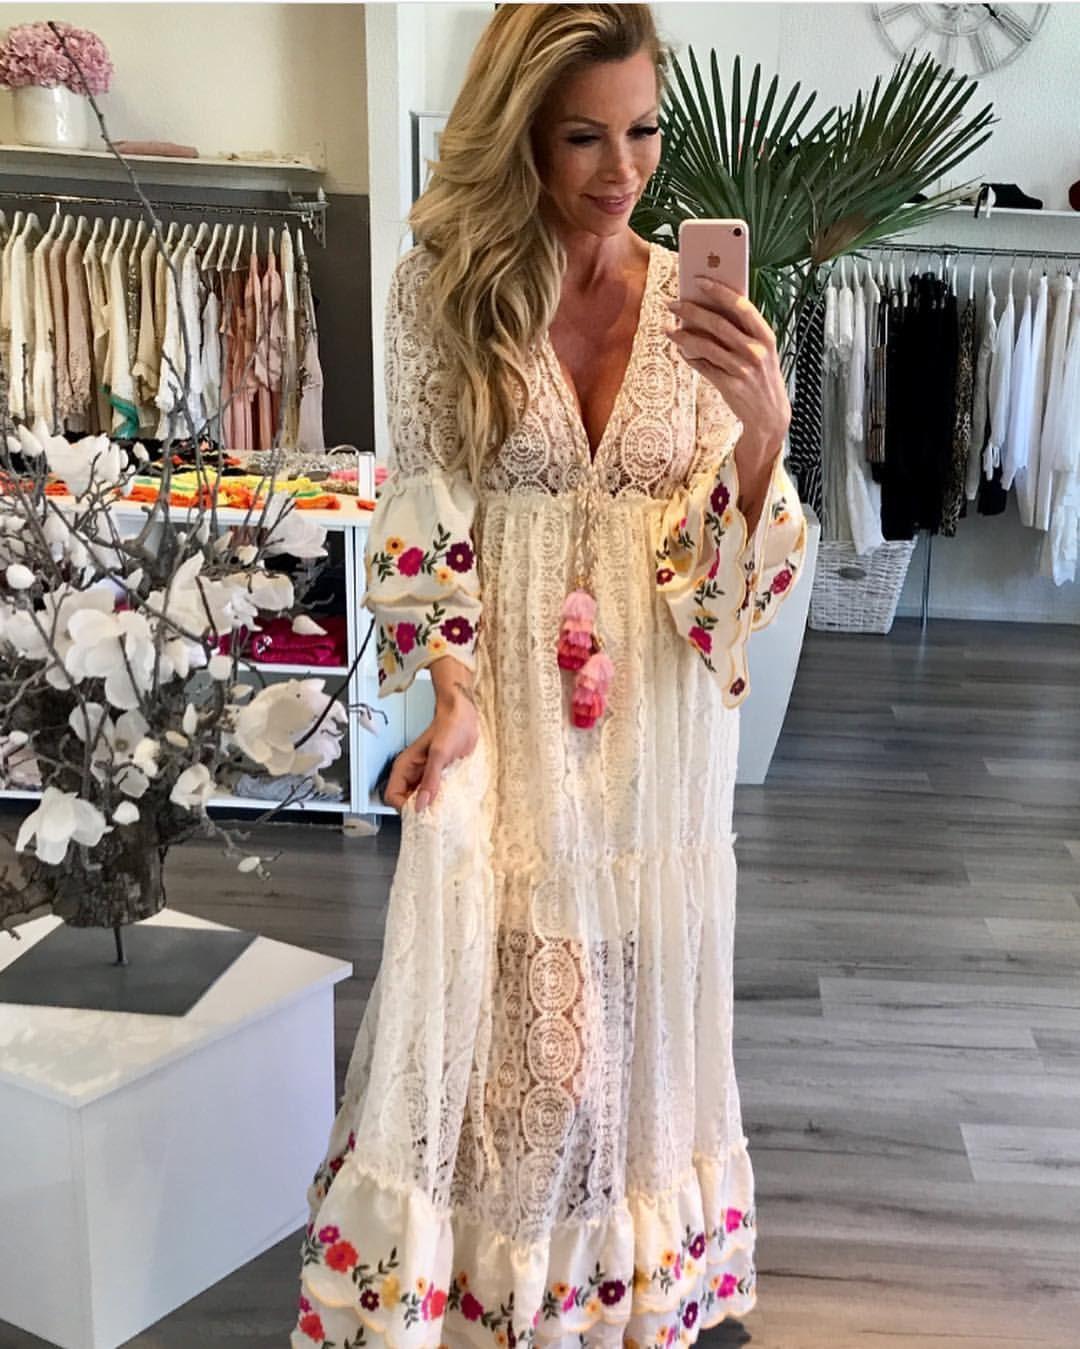 458a9d7bb025b #look #trendy #inspiration #dress #maxi #flowers #ibiza #maxidress #love  #bohochic #style #boho #cute #pretty #chic #bohemian #photo…